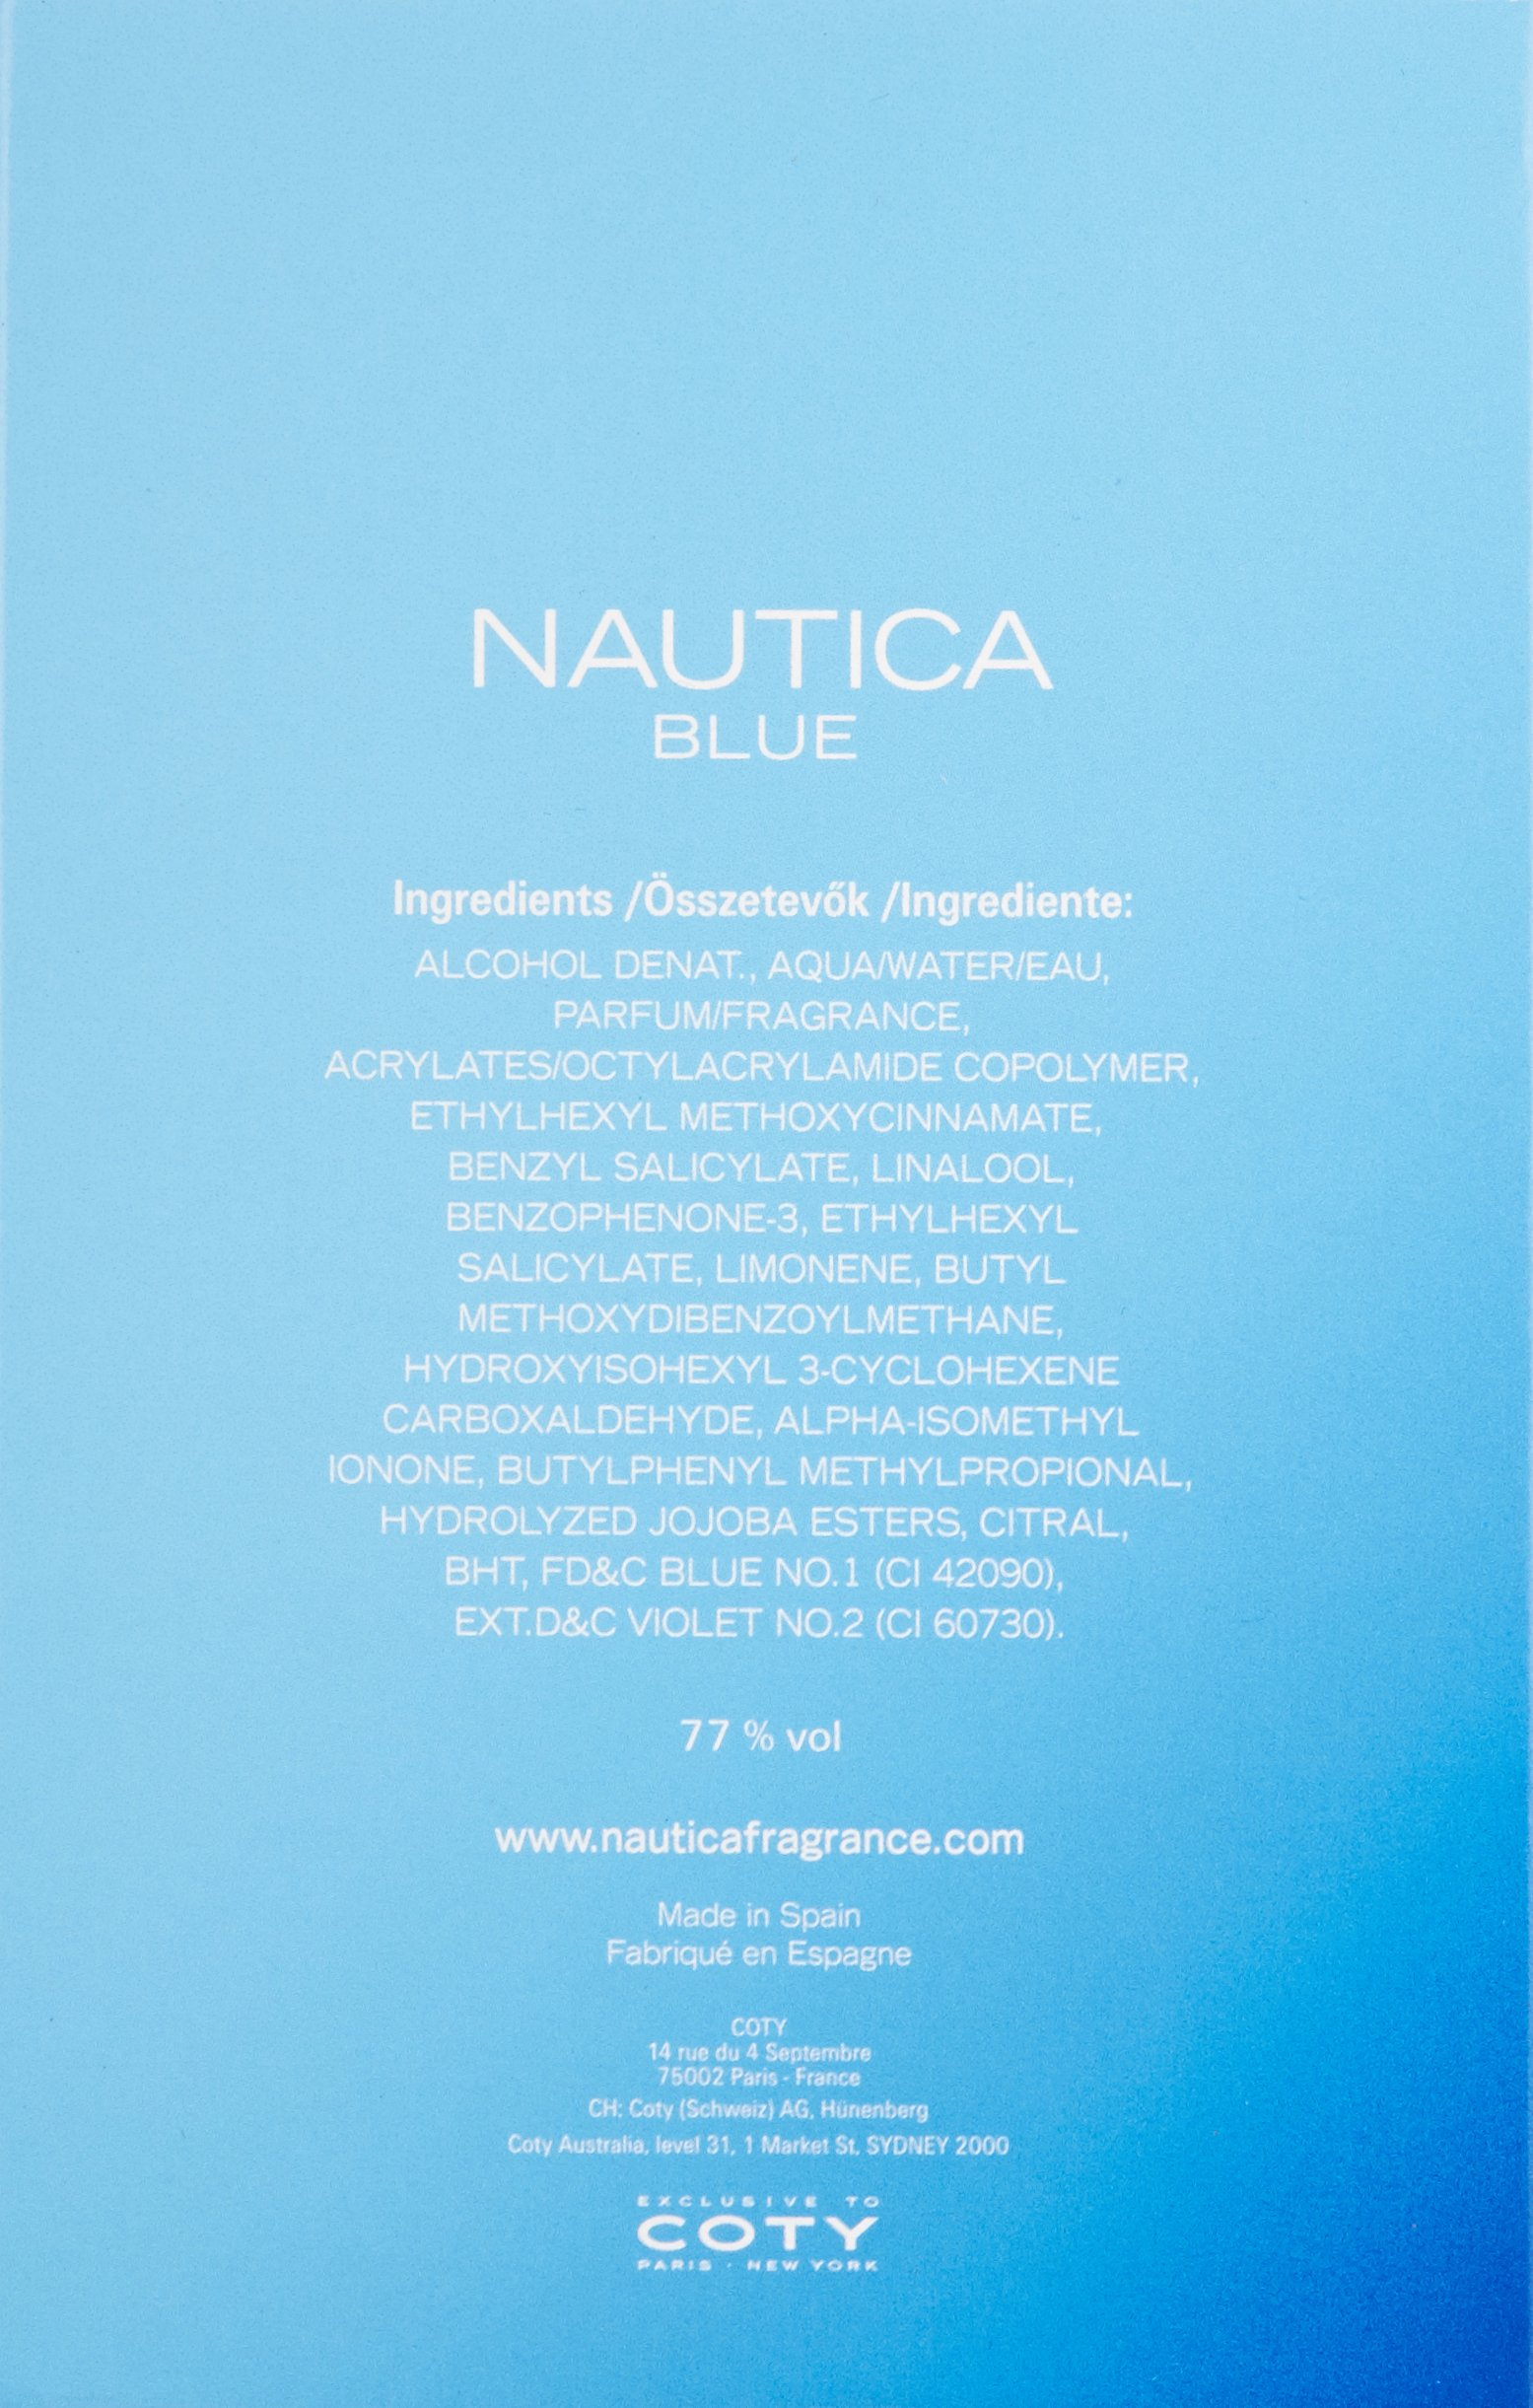 Nautica Blue Eau De Toilette Spray for Men, 3.4 fluid ounce by Nautica (Image #2)